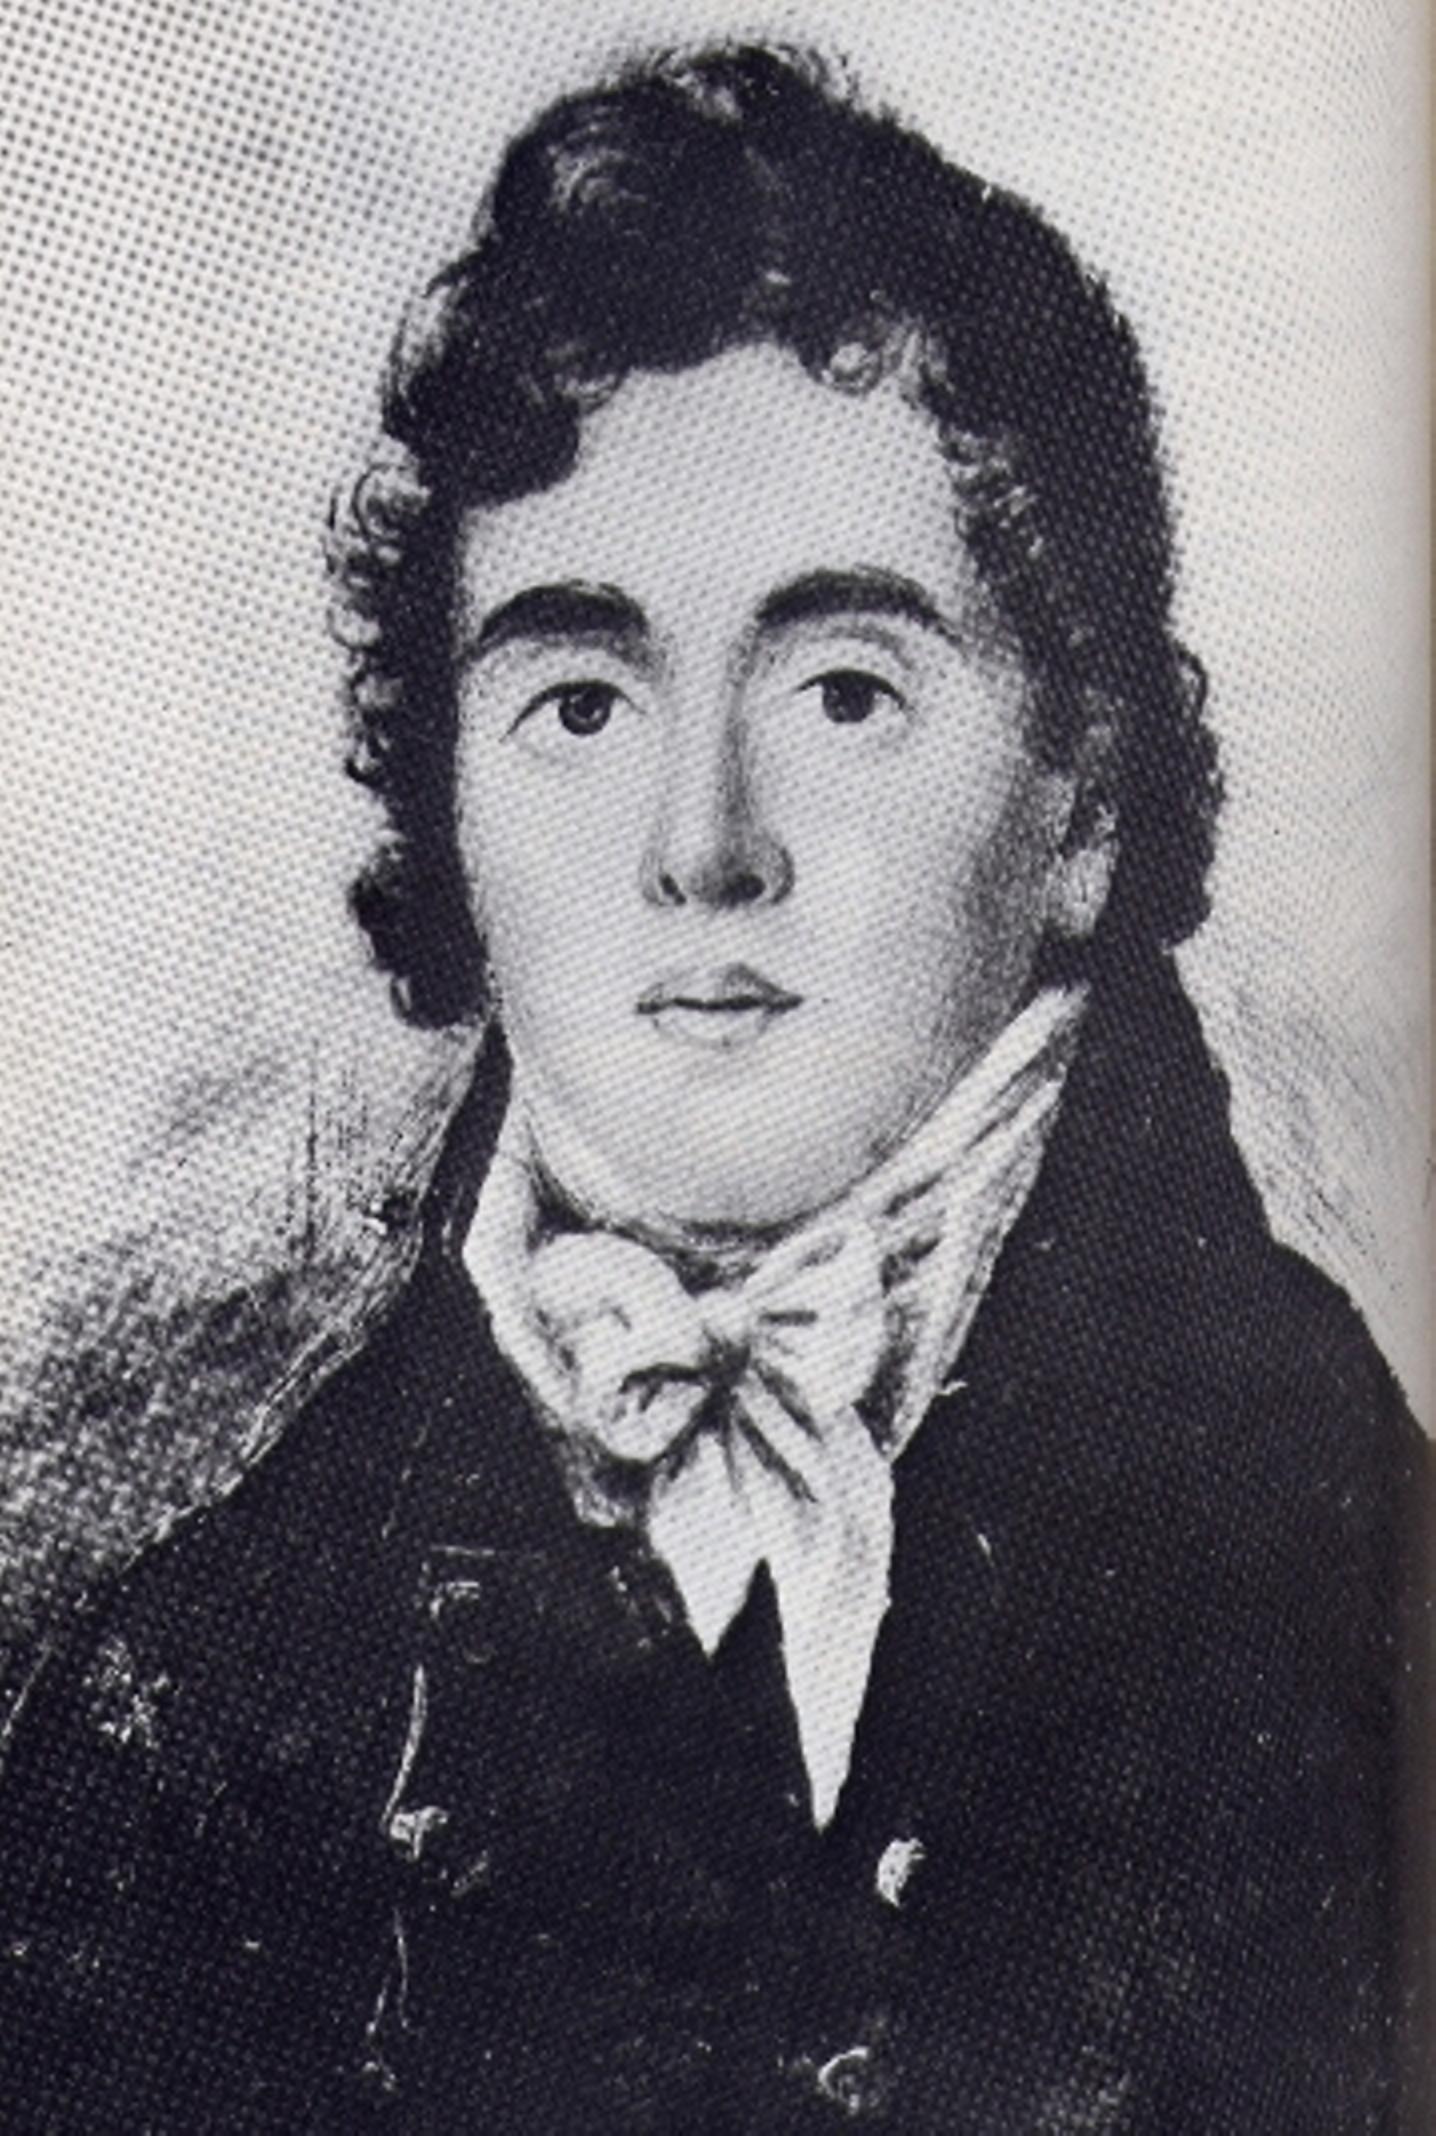 Lord George Bryan Brummel